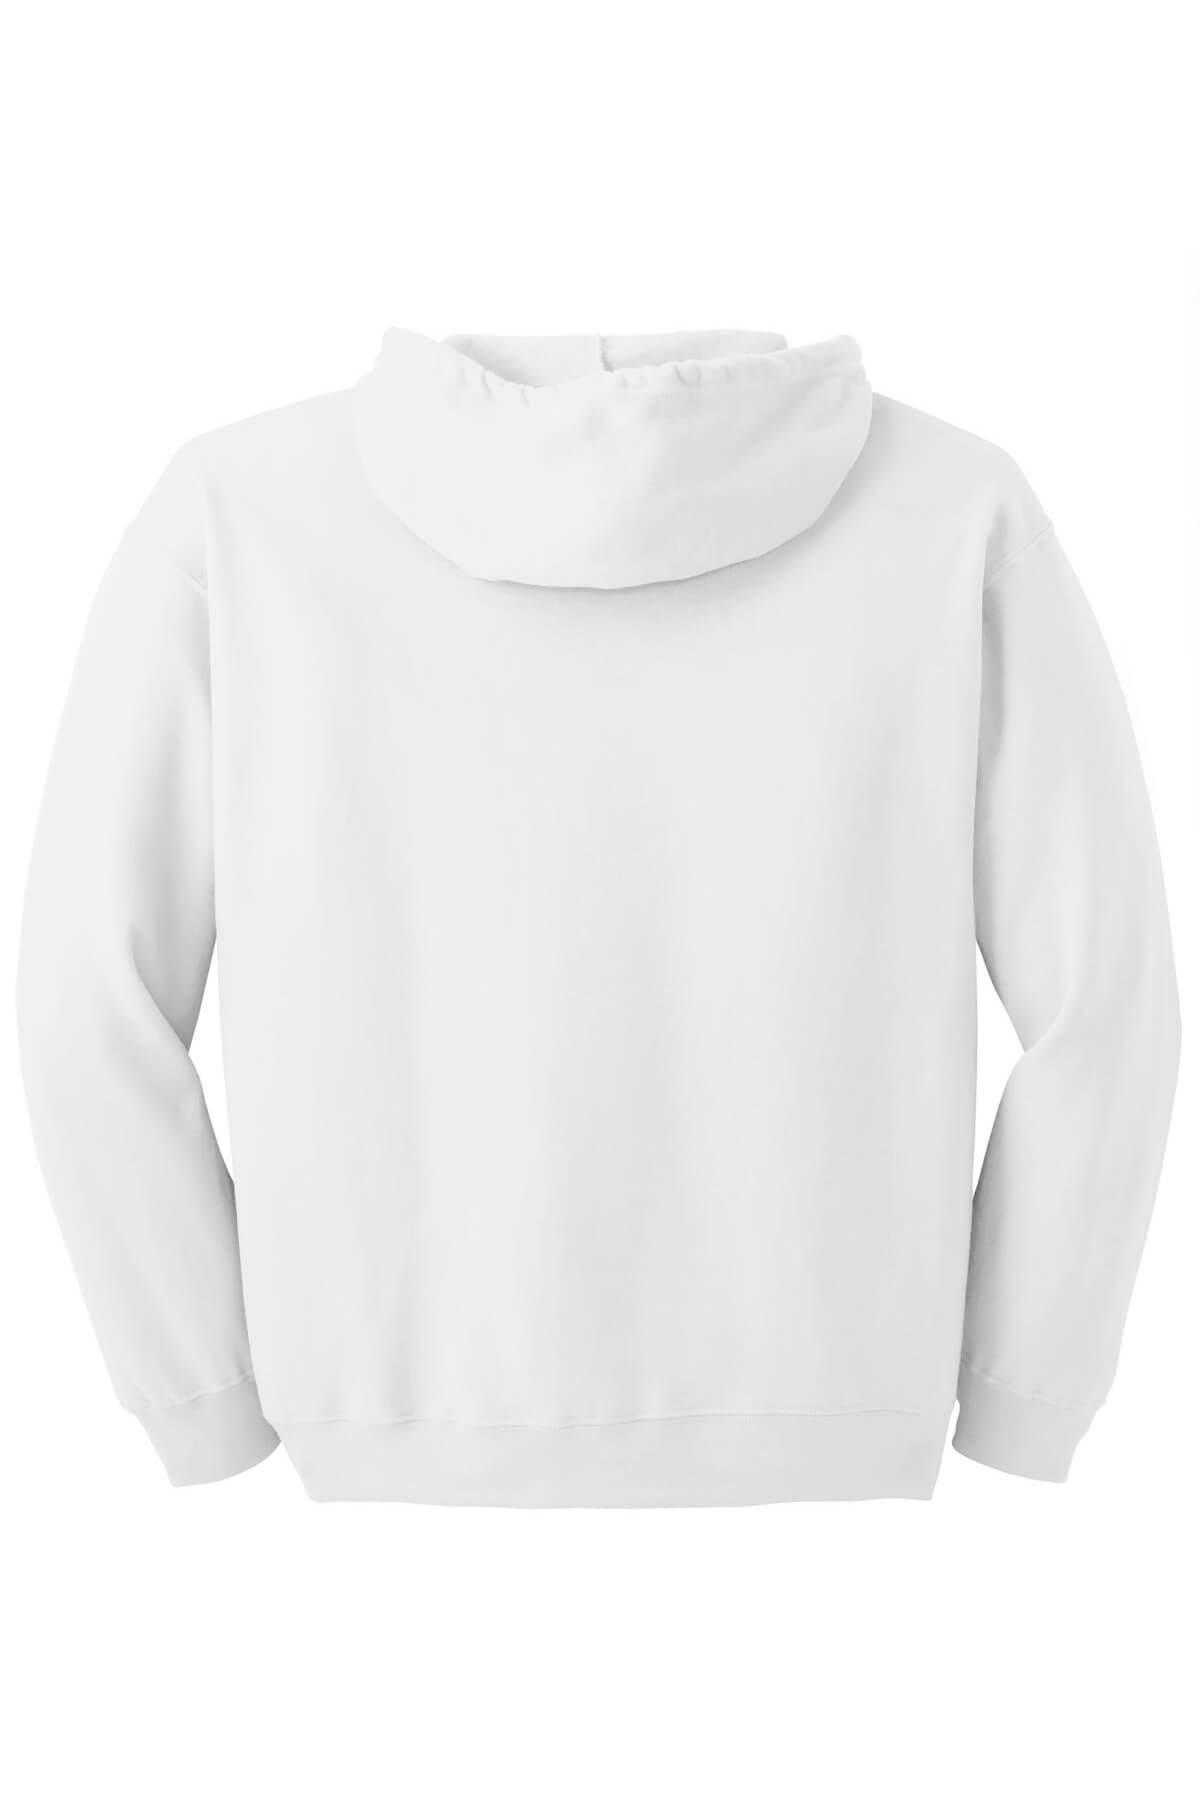 18600-white-3